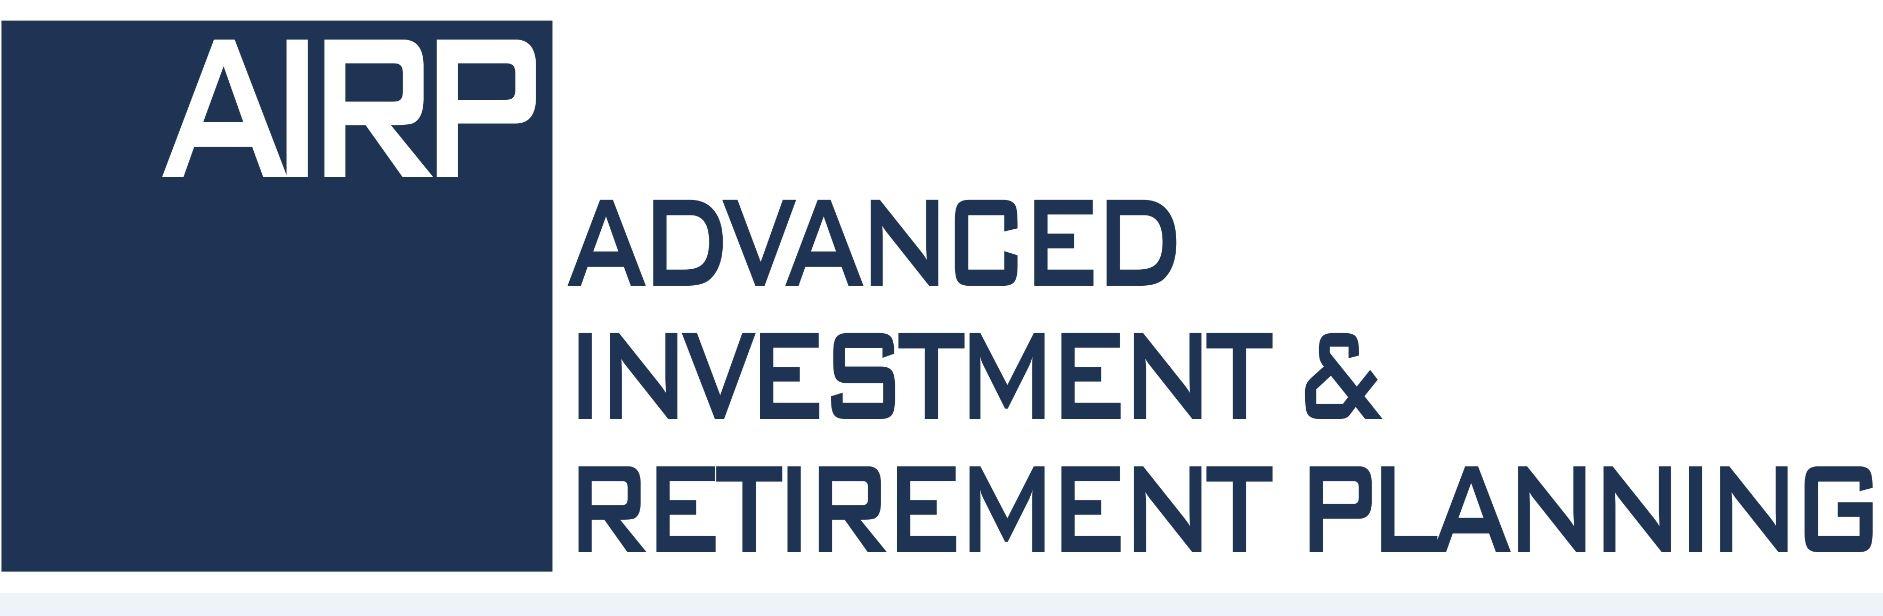 Advanced Investment & Retirement Planning Ltd